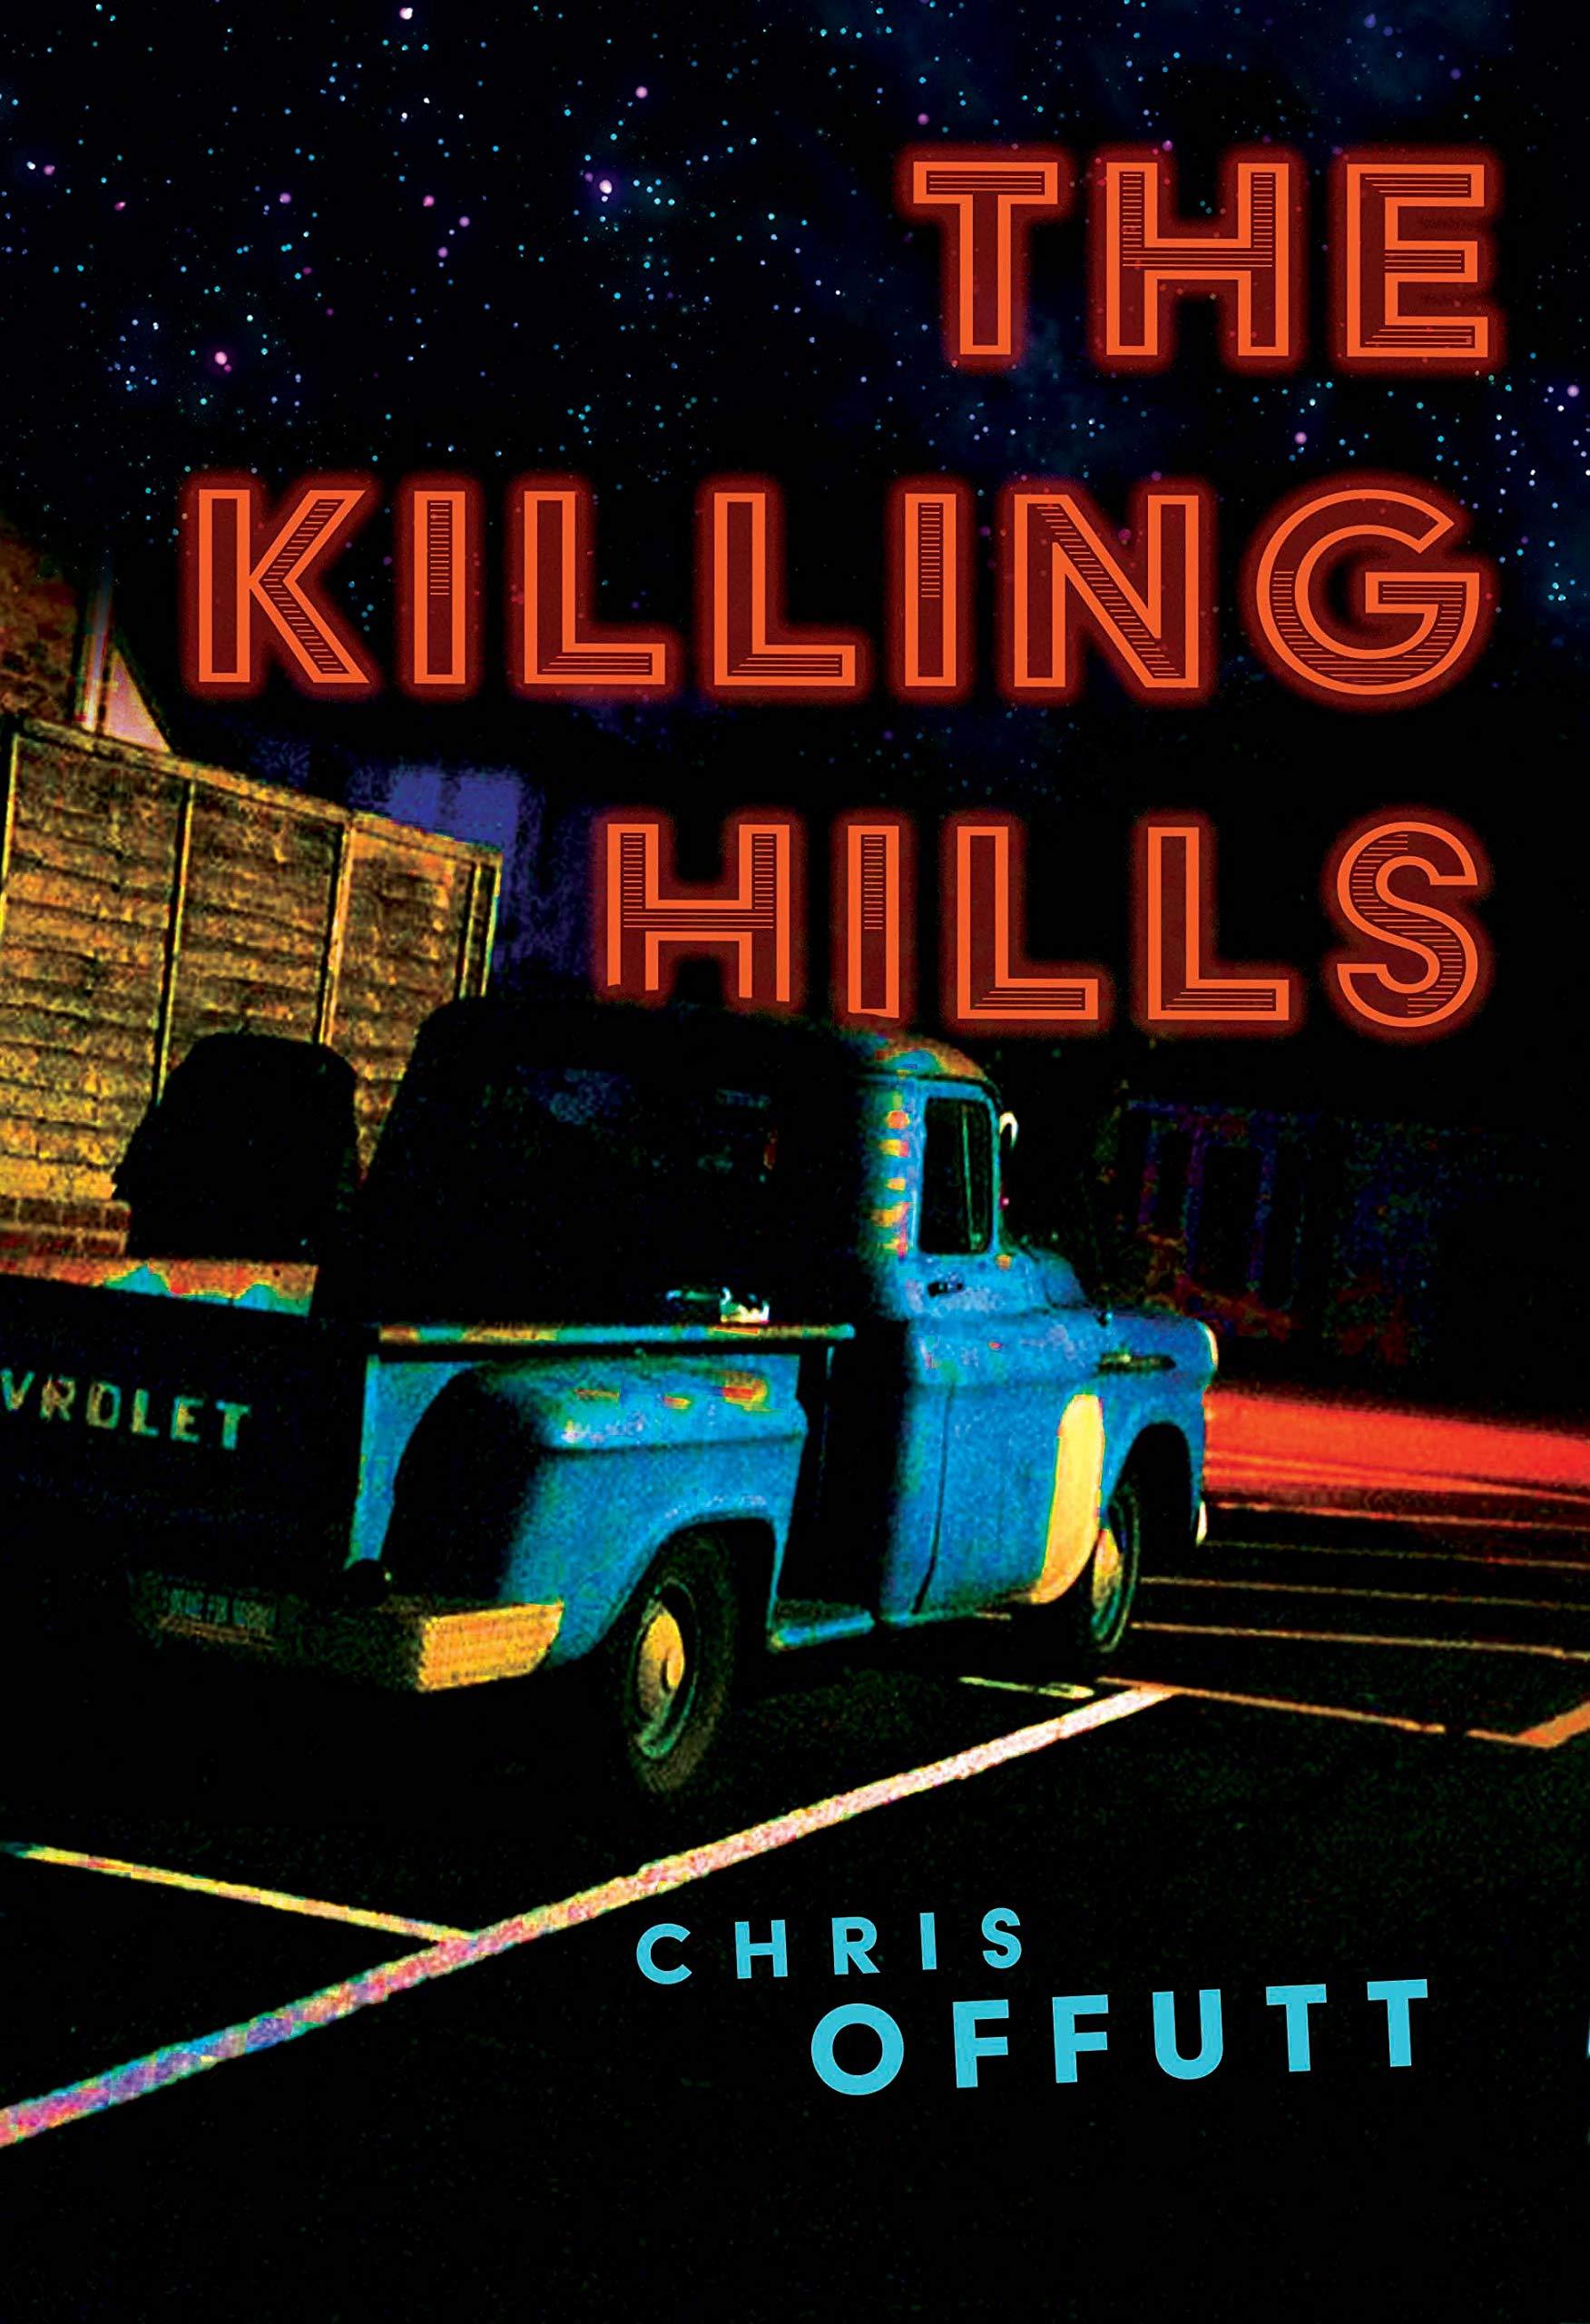 Amazon.com: The Killing Hills (9780802158413): Offutt, Chris: Books